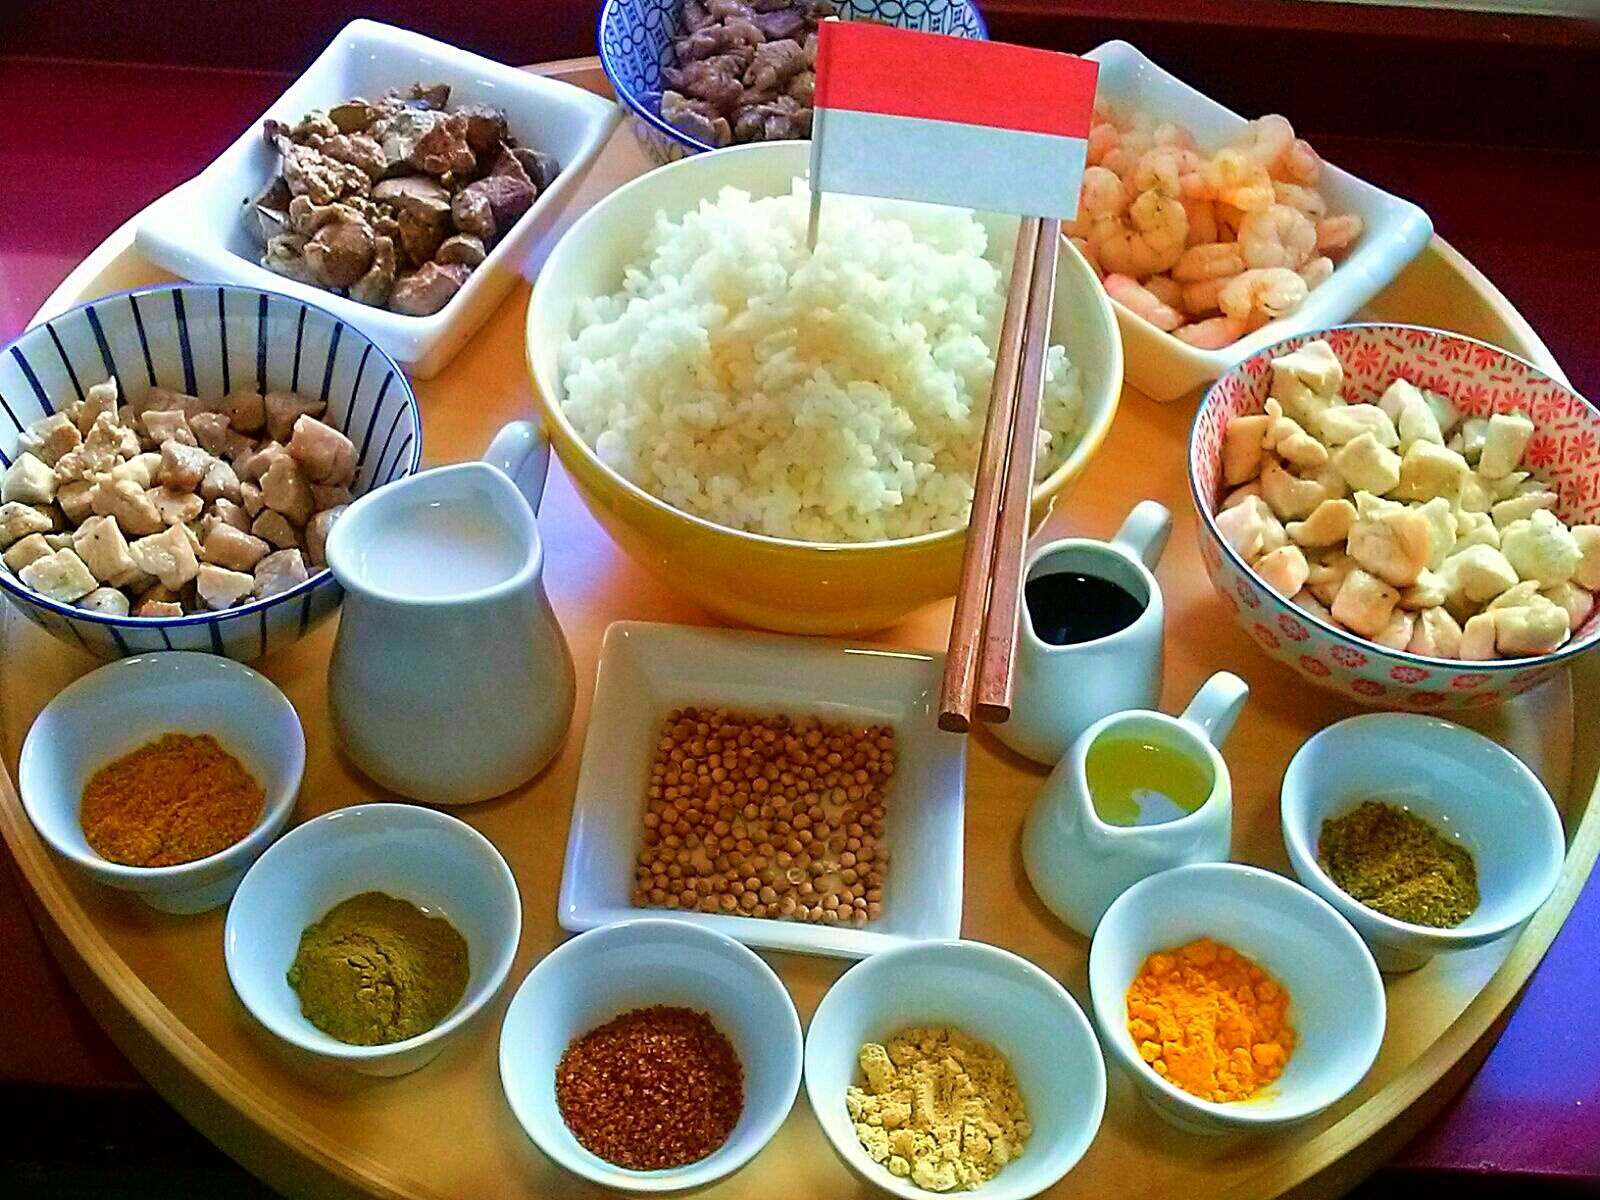 Rijsttafel o Mesa de arroz de Indonesia. [Cena de Navidad Worldwide]